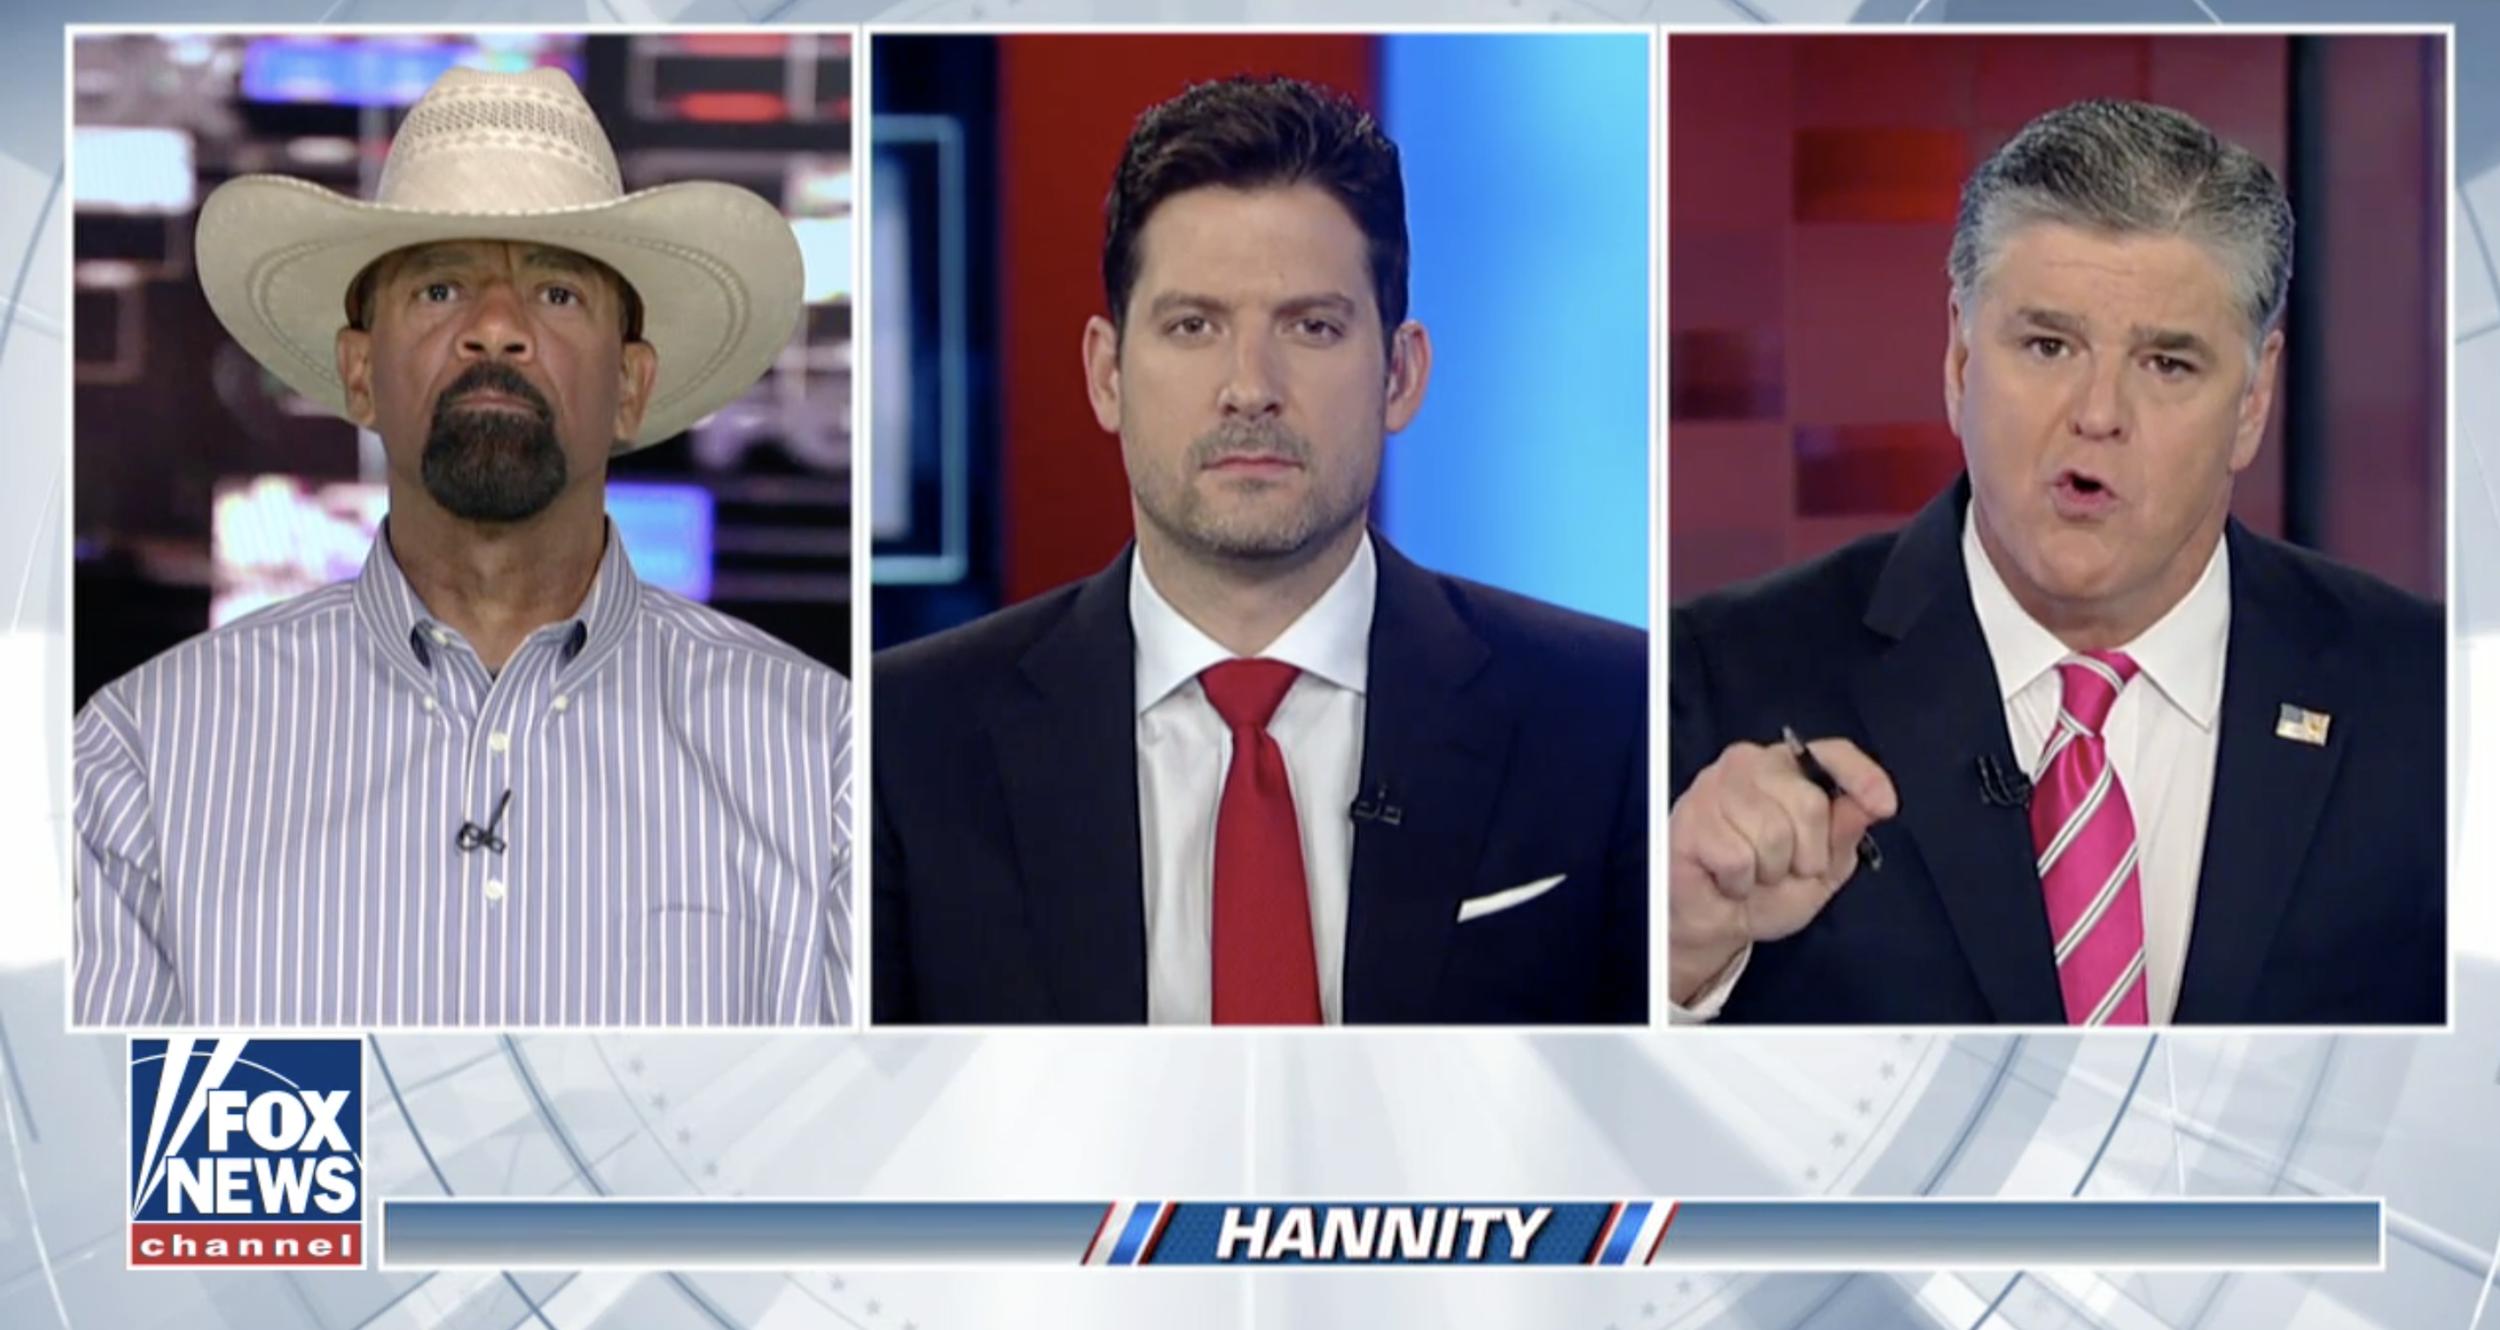 Brett Velicovich and Sean Hannity